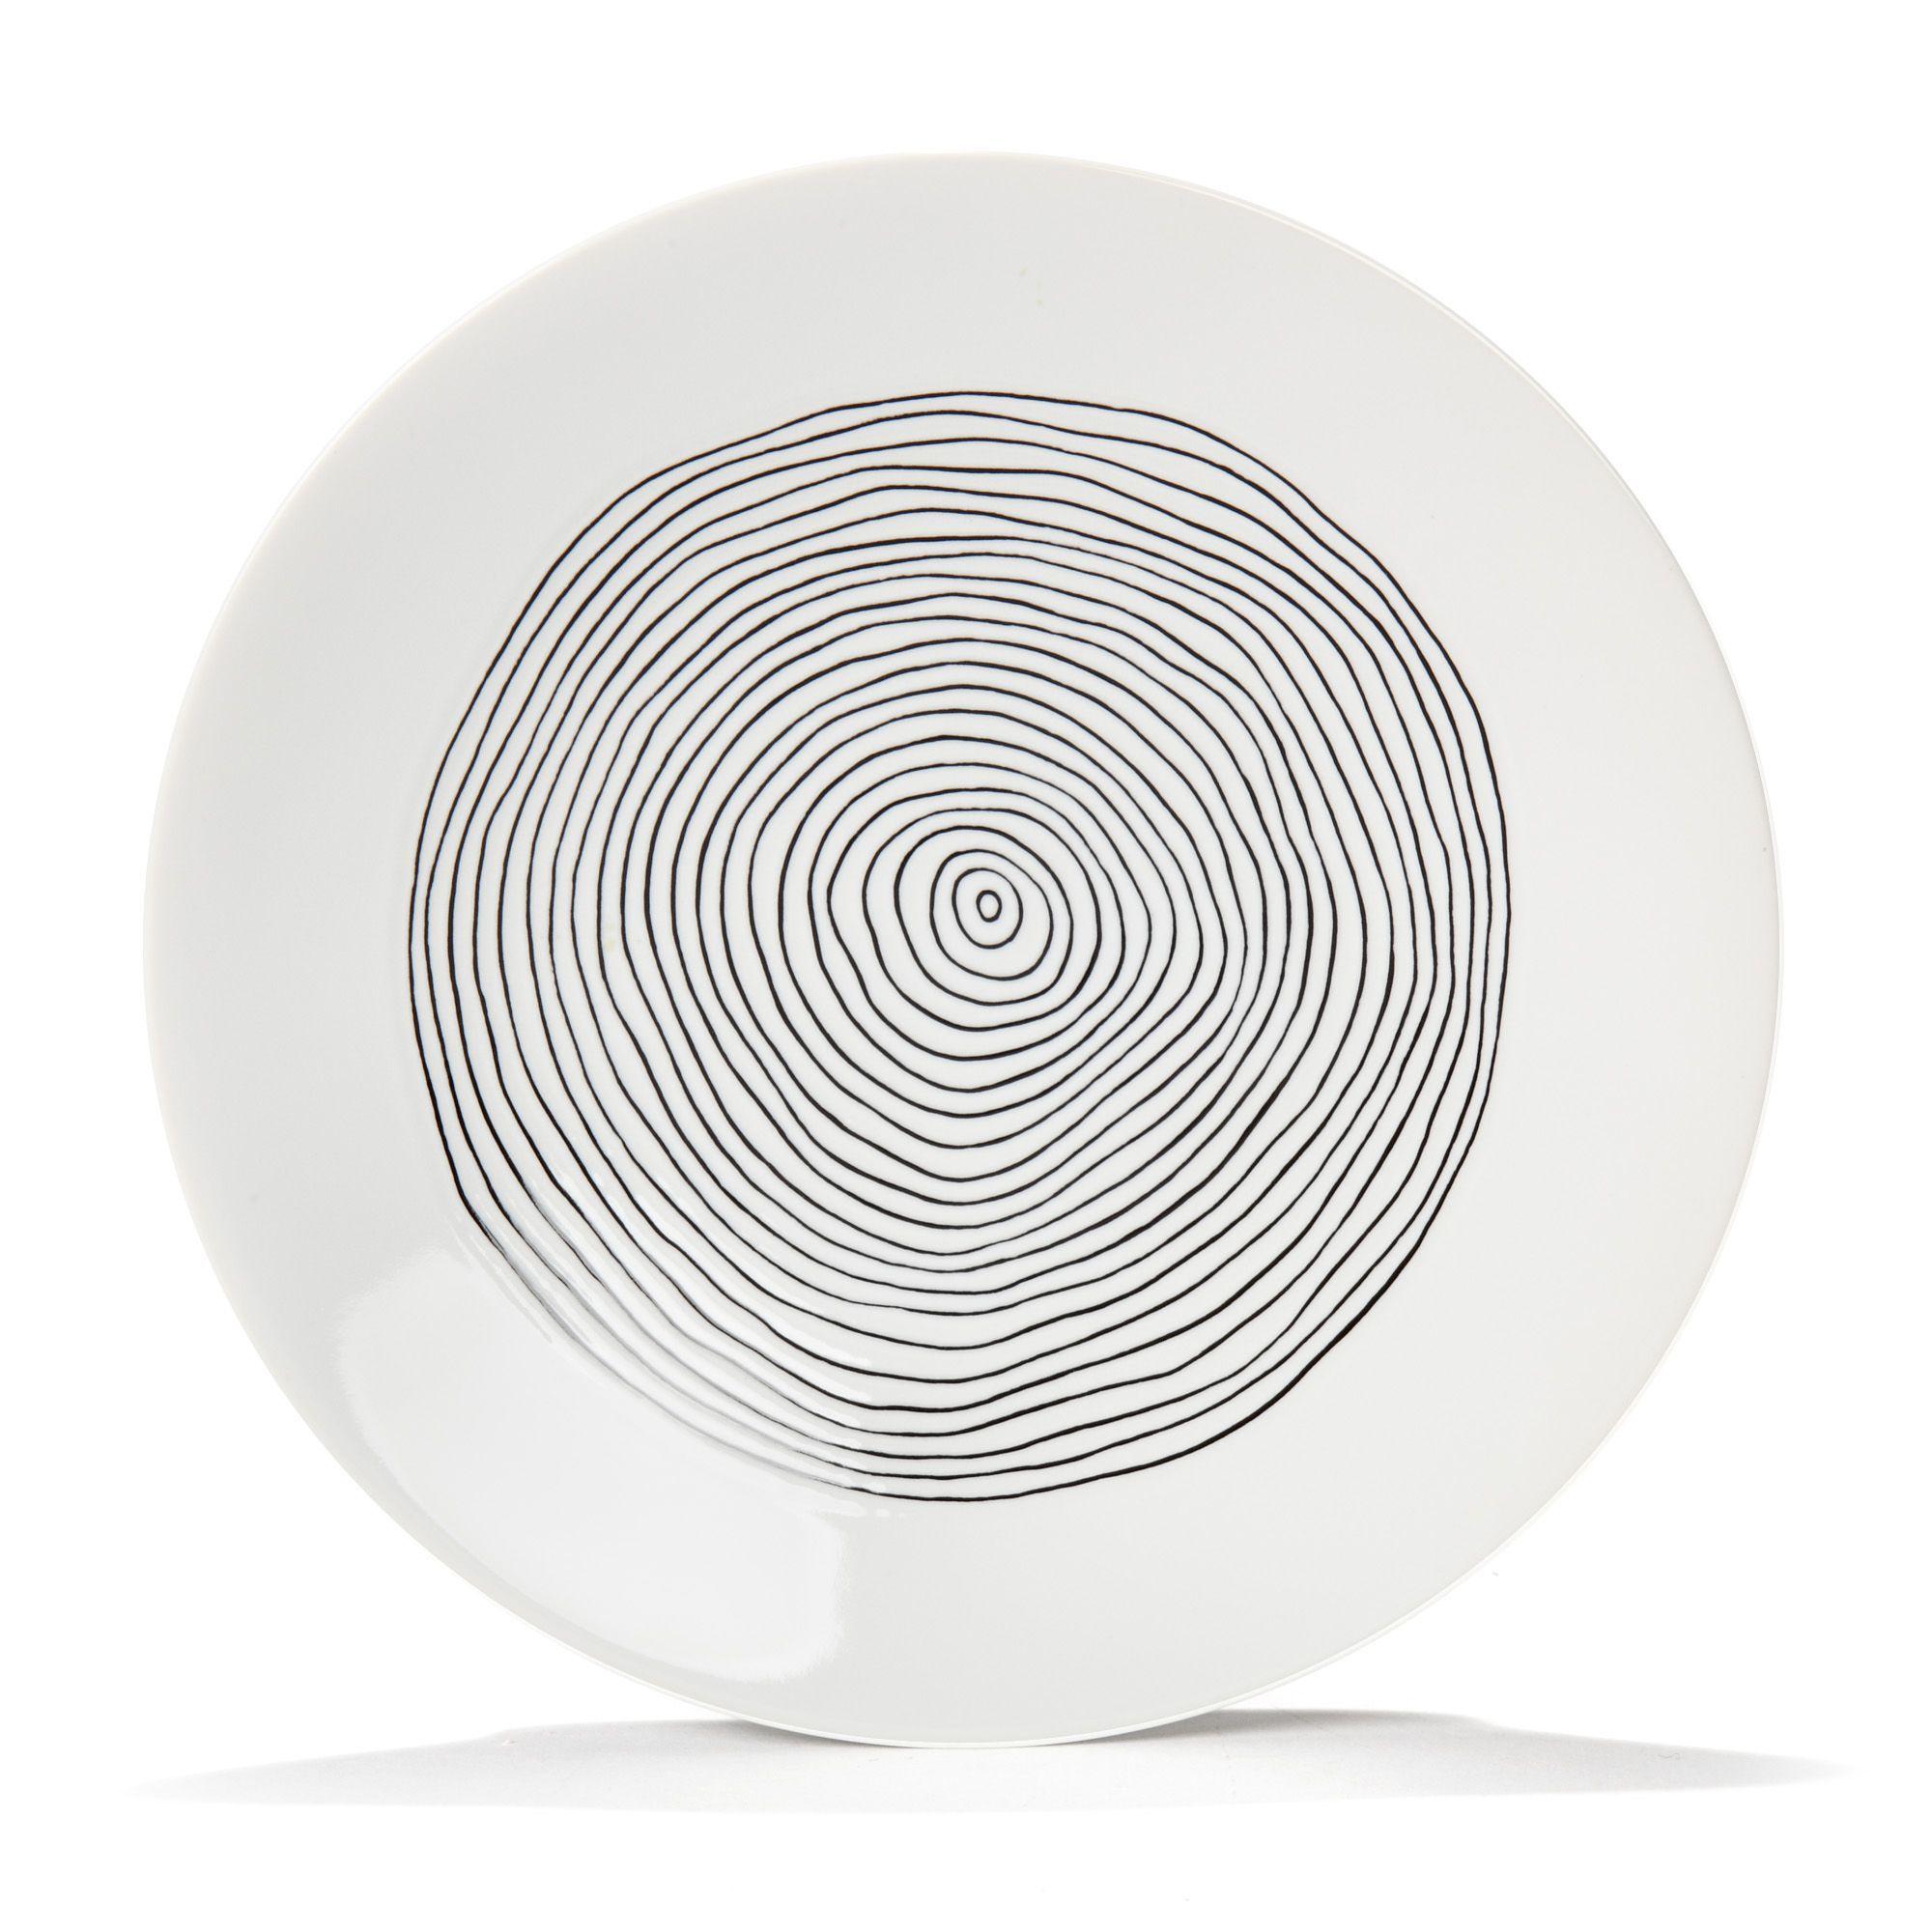 assiette dessert en gr s blanc avec lignes irr guli res. Black Bedroom Furniture Sets. Home Design Ideas